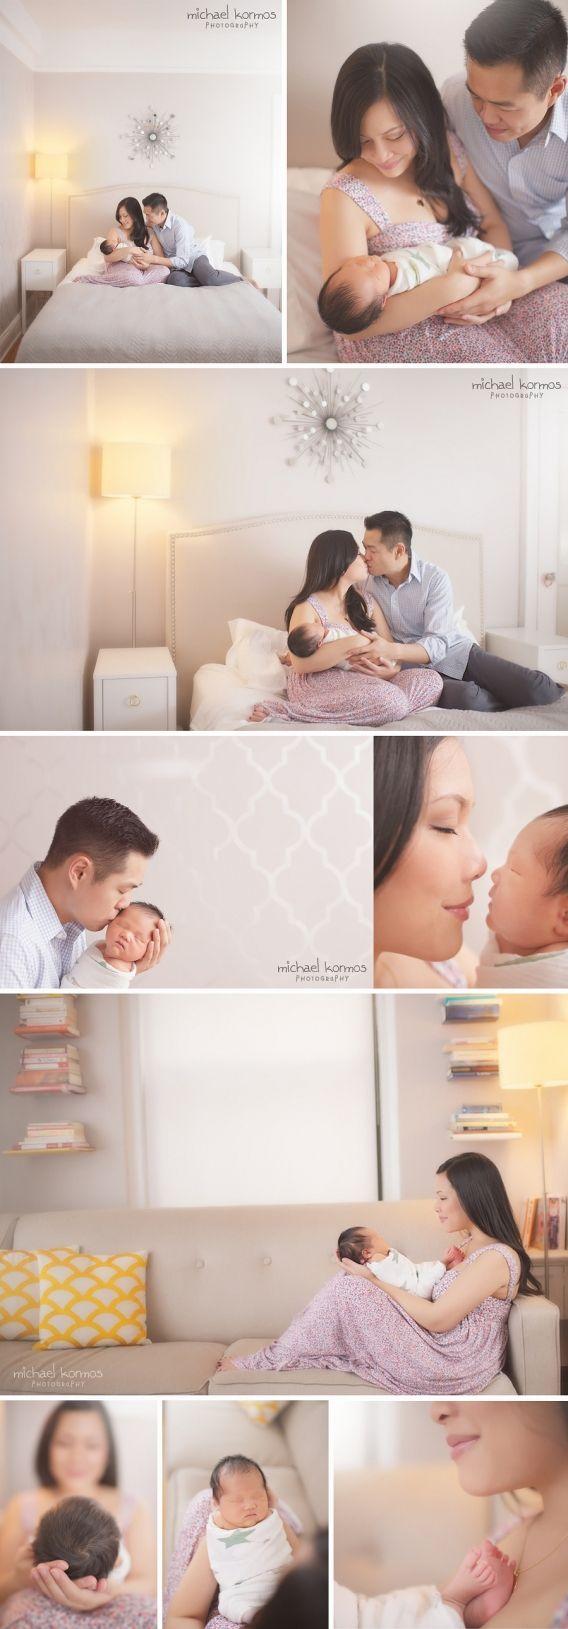 Family & newborn photography by Michael Kormos